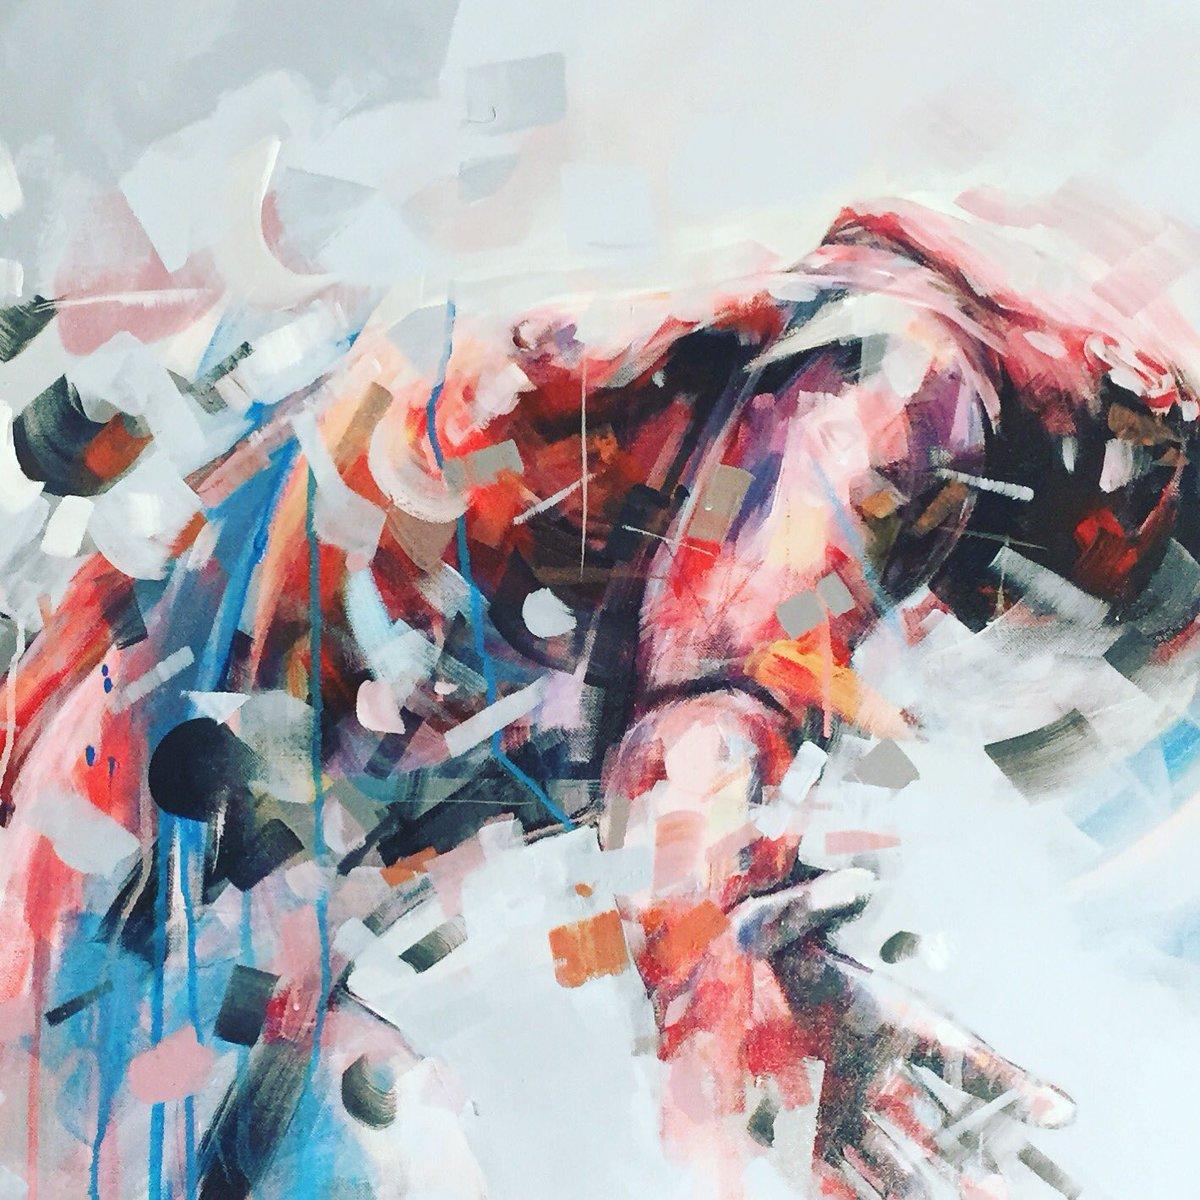 Dairo Vargas On Twitter Closeup Mixed Media On Canvas Movement Body Art Painting